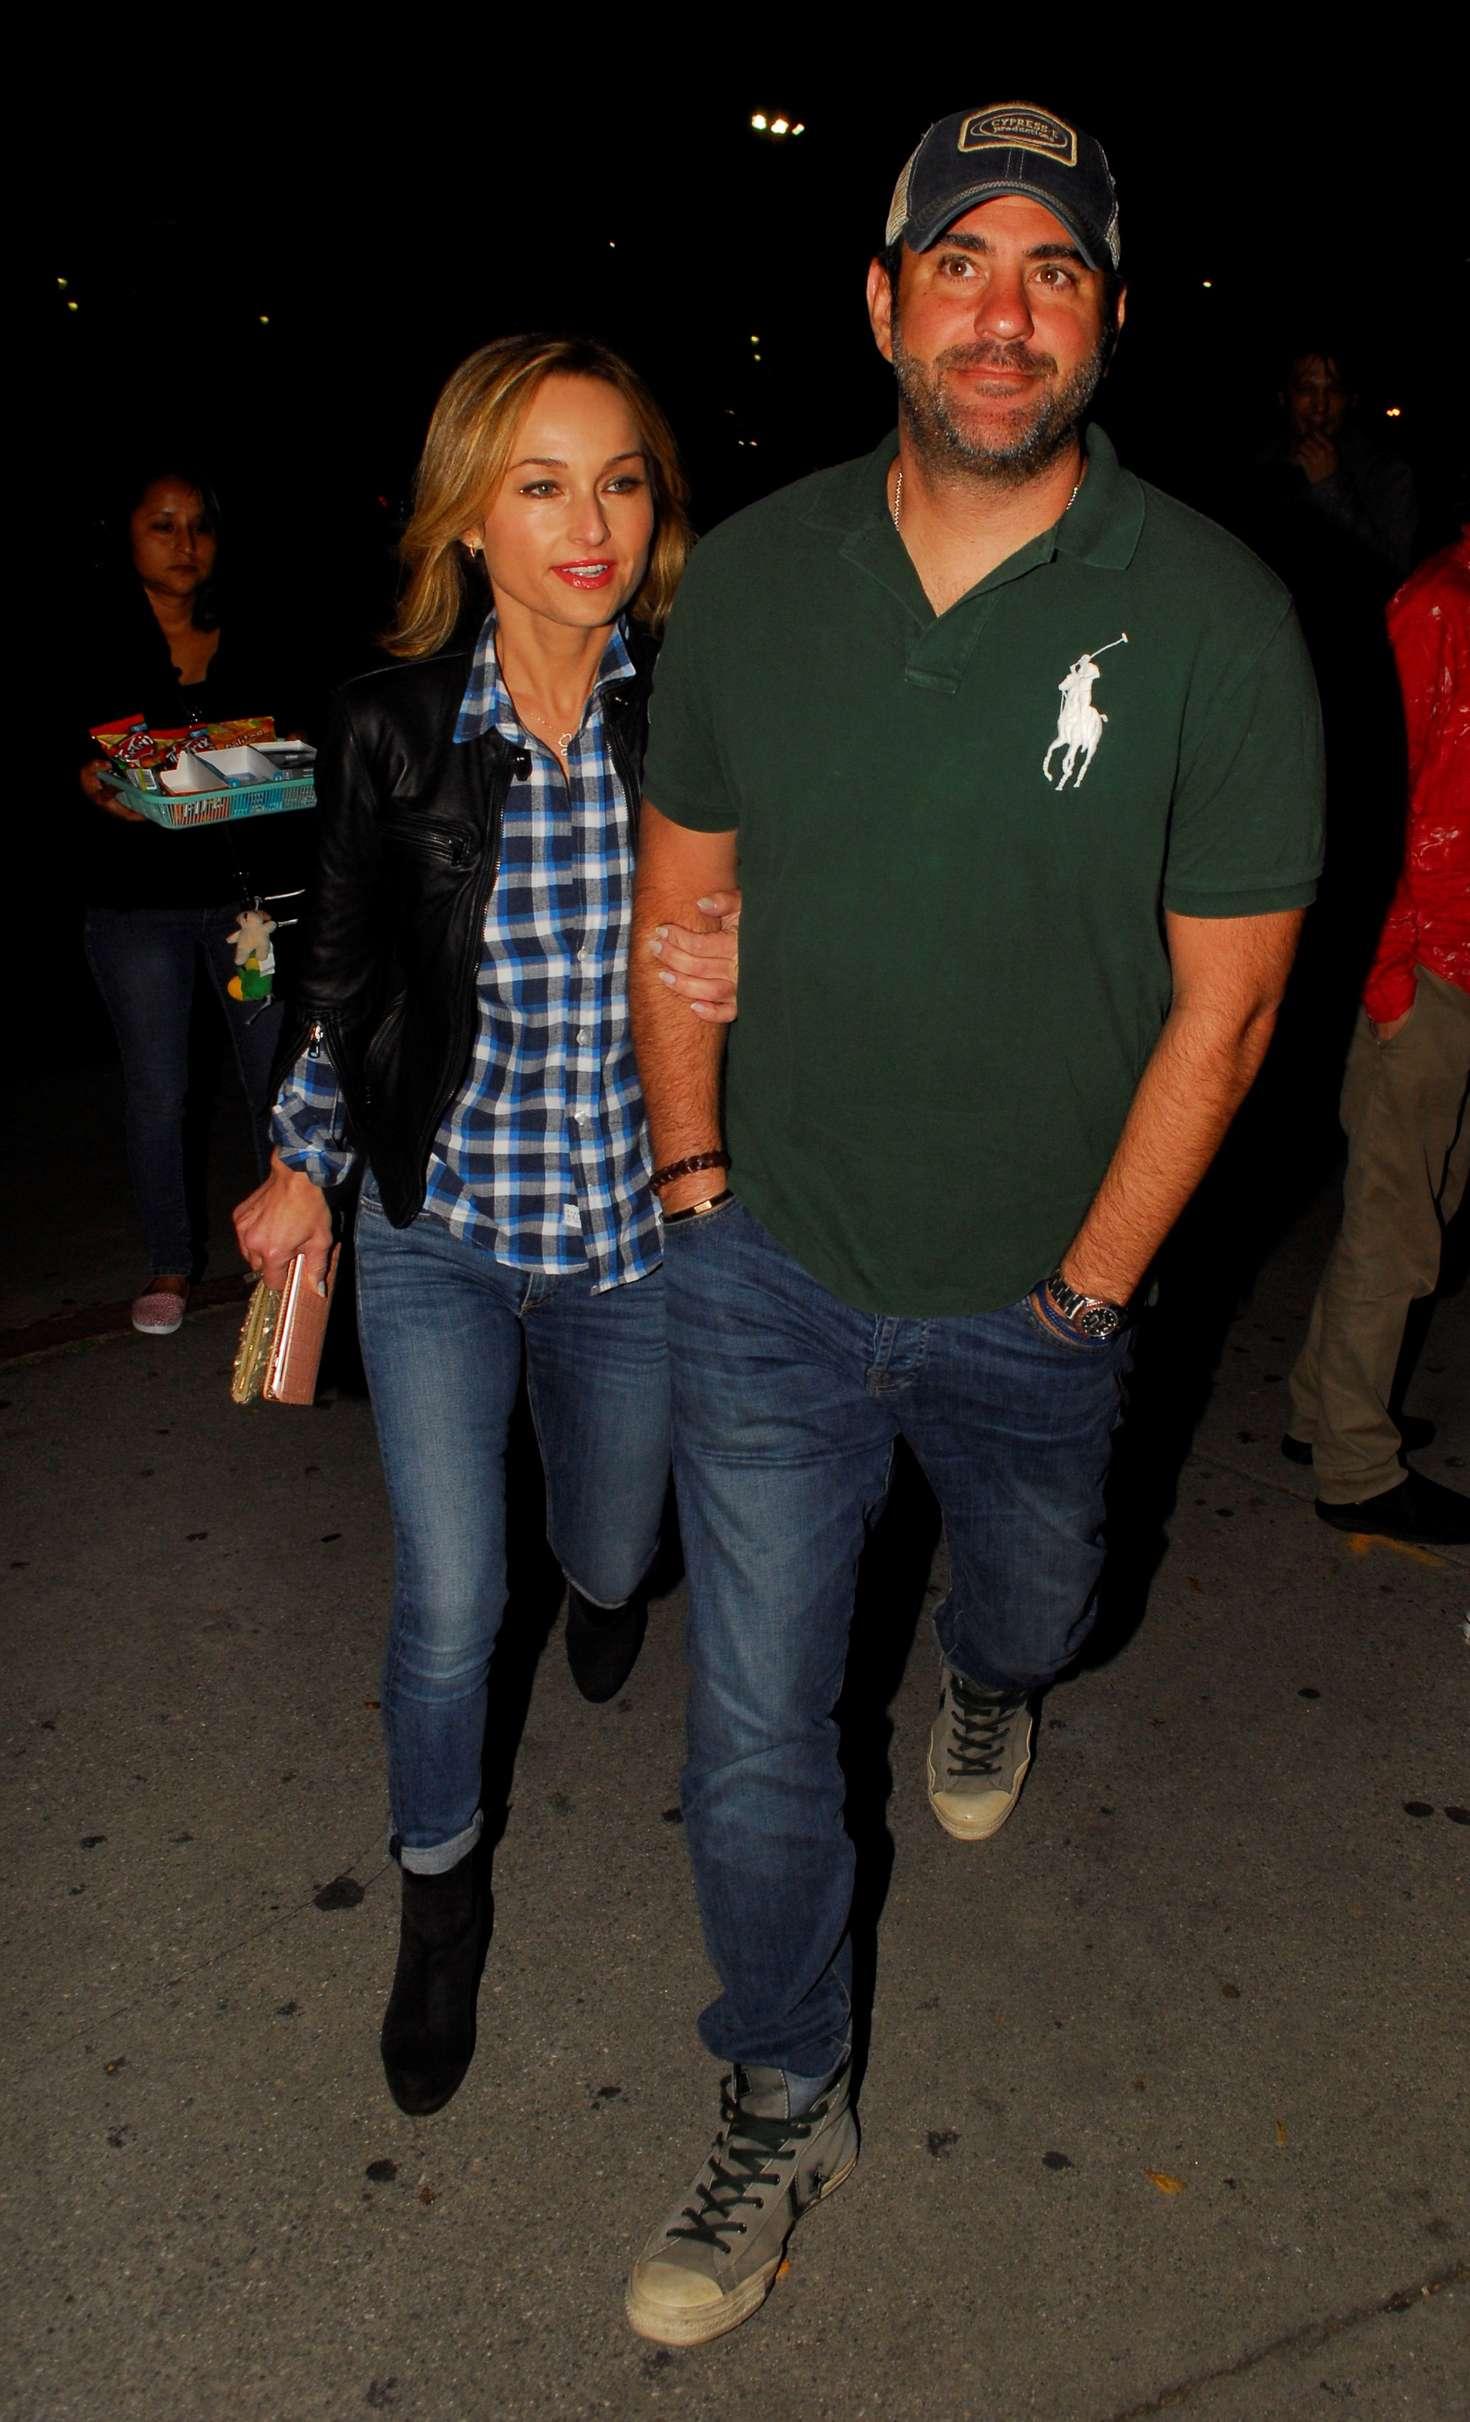 Giada De Laurentiis and boyfriend at the Bruce Springsteen Concert in Los Angeles